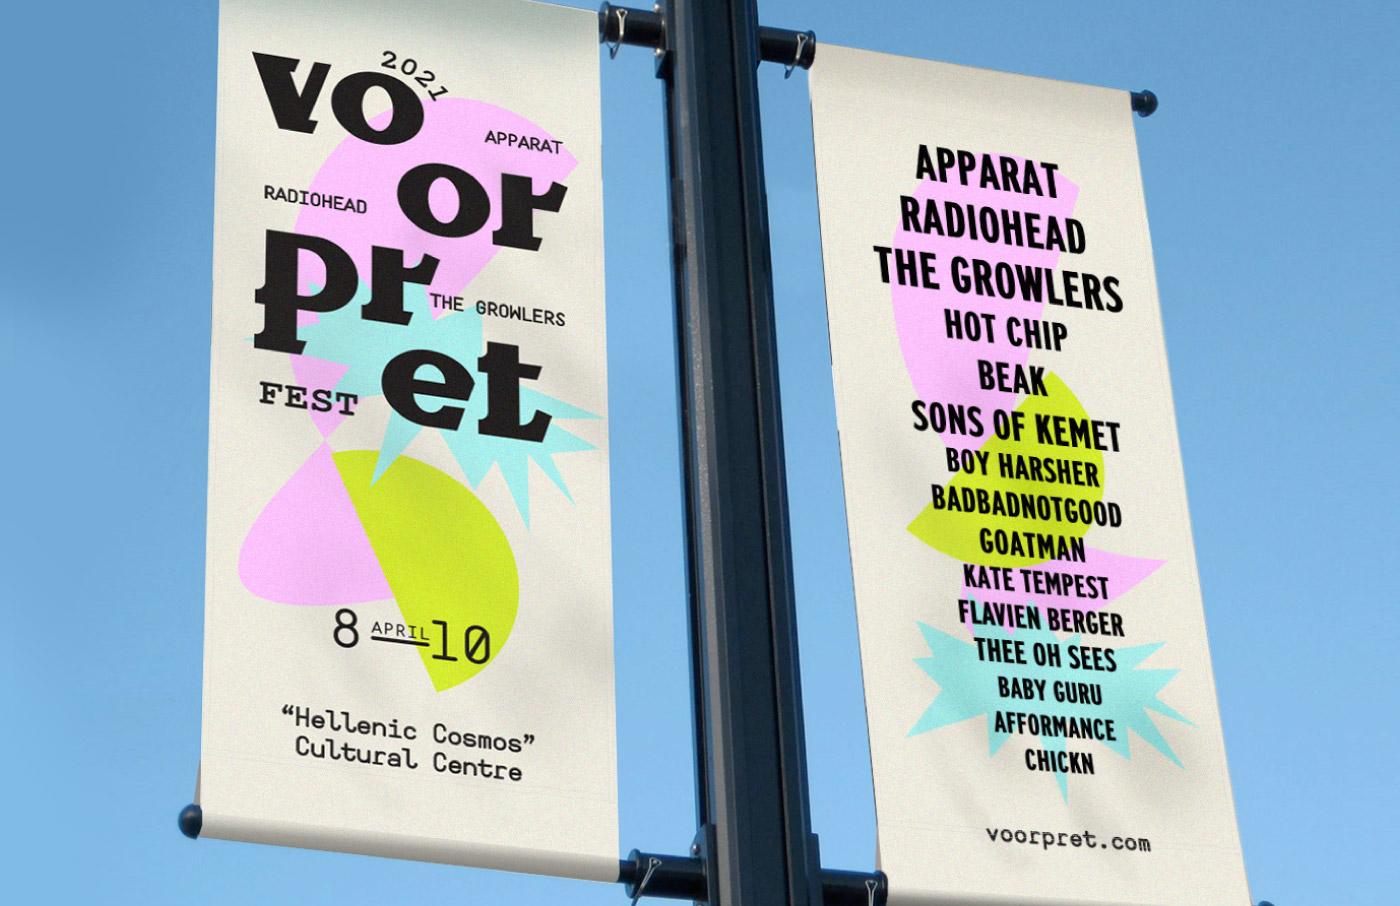 music festival concert logo poster design visual identity colors gig banner venue lineup